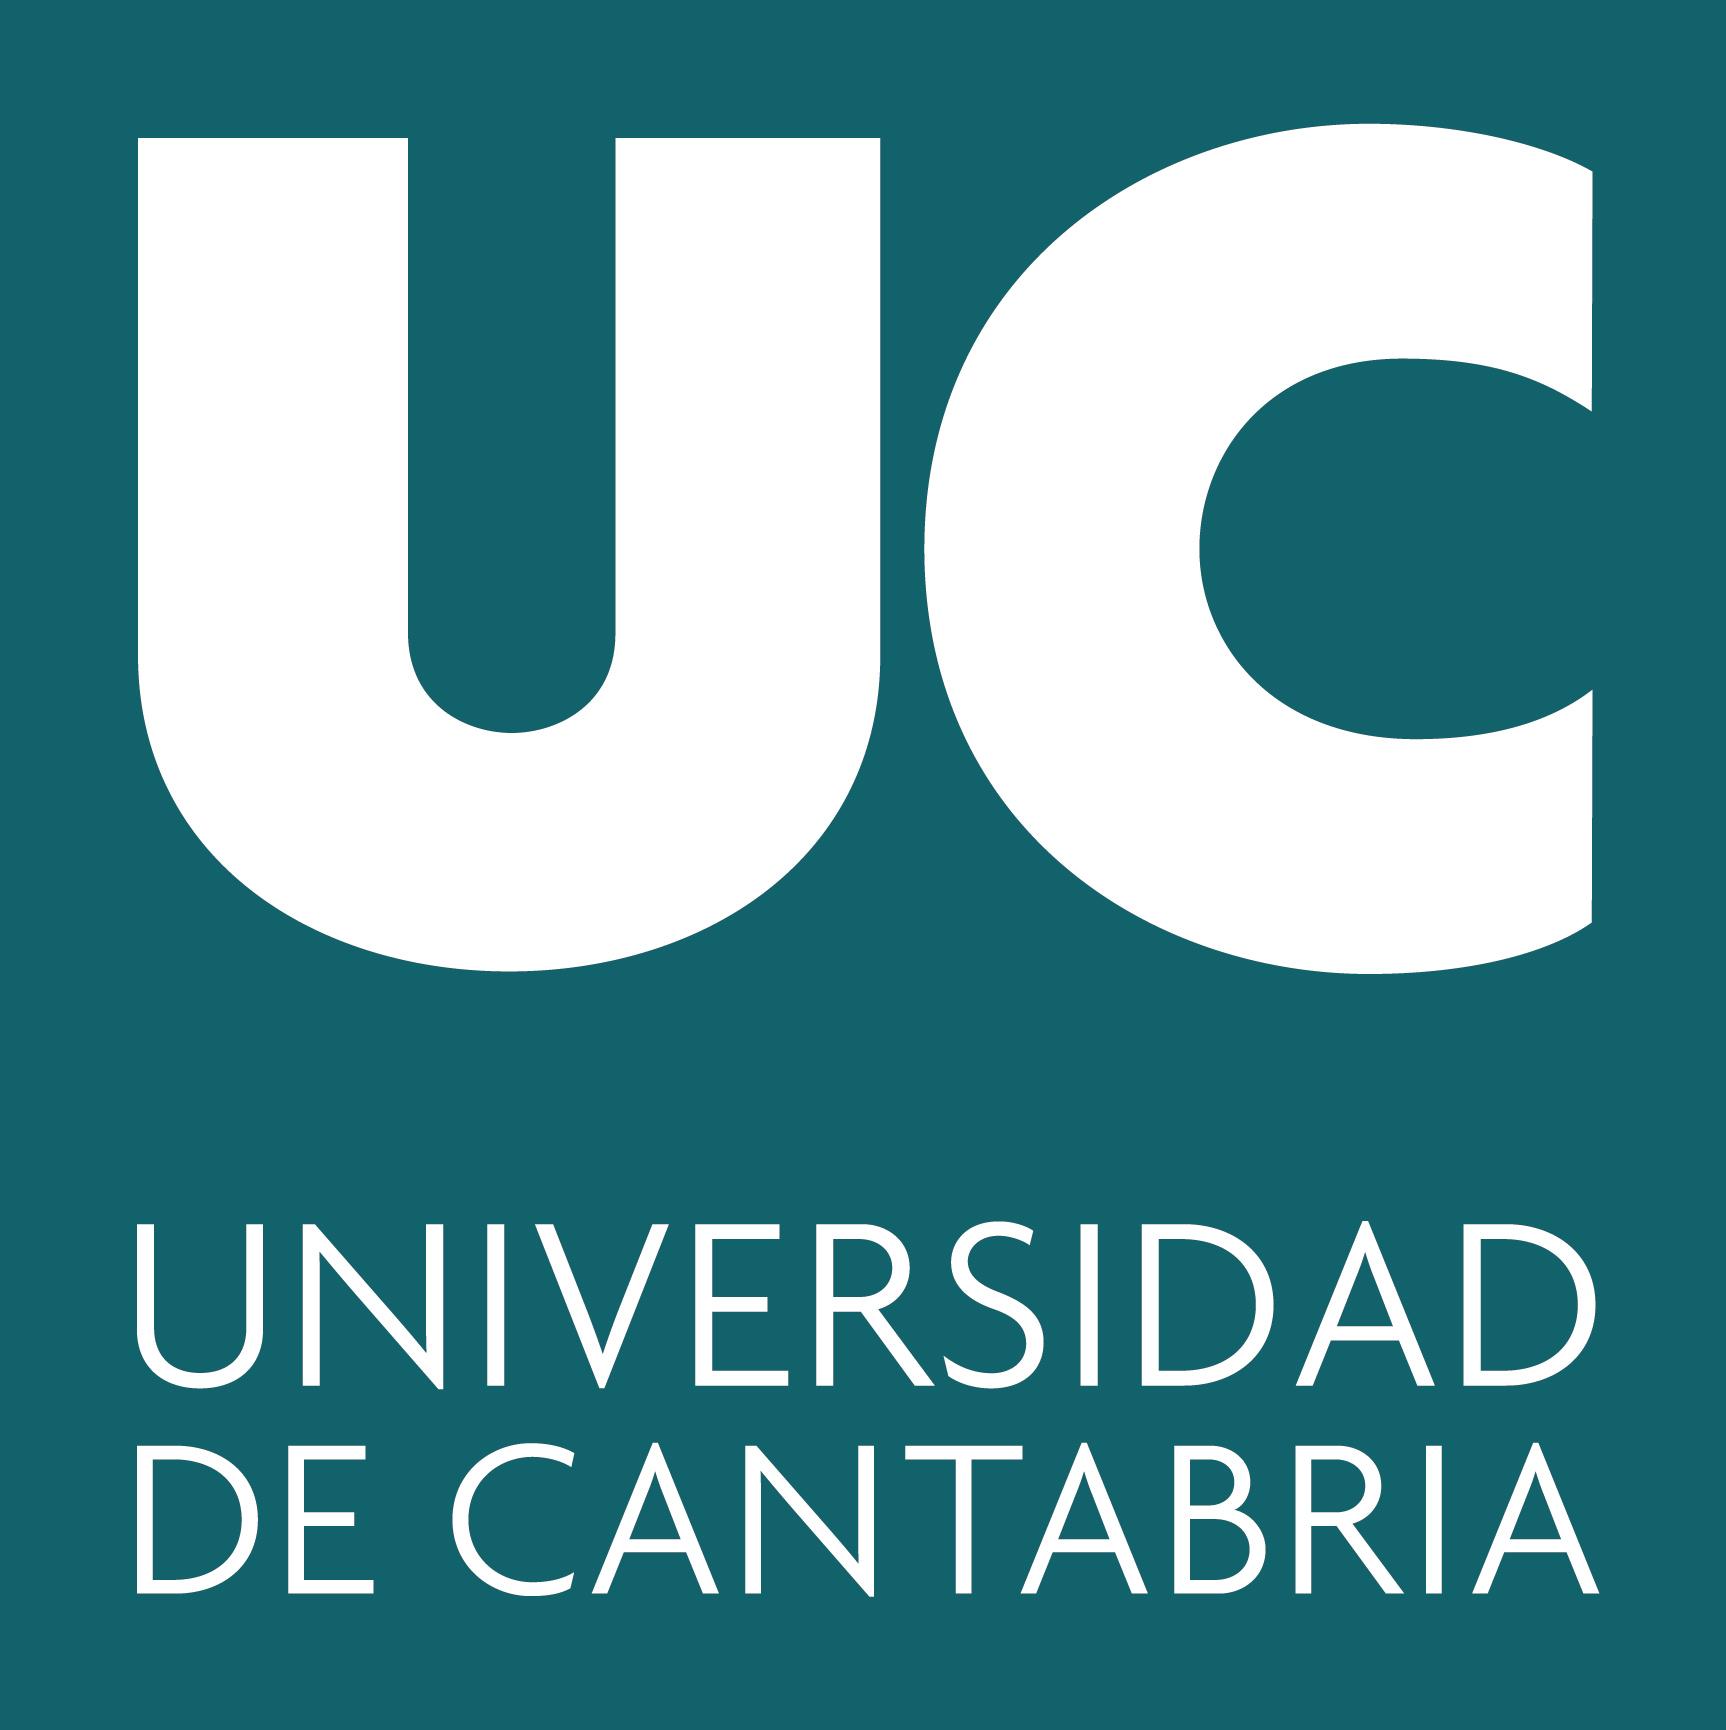 logo_UC_verde_grande